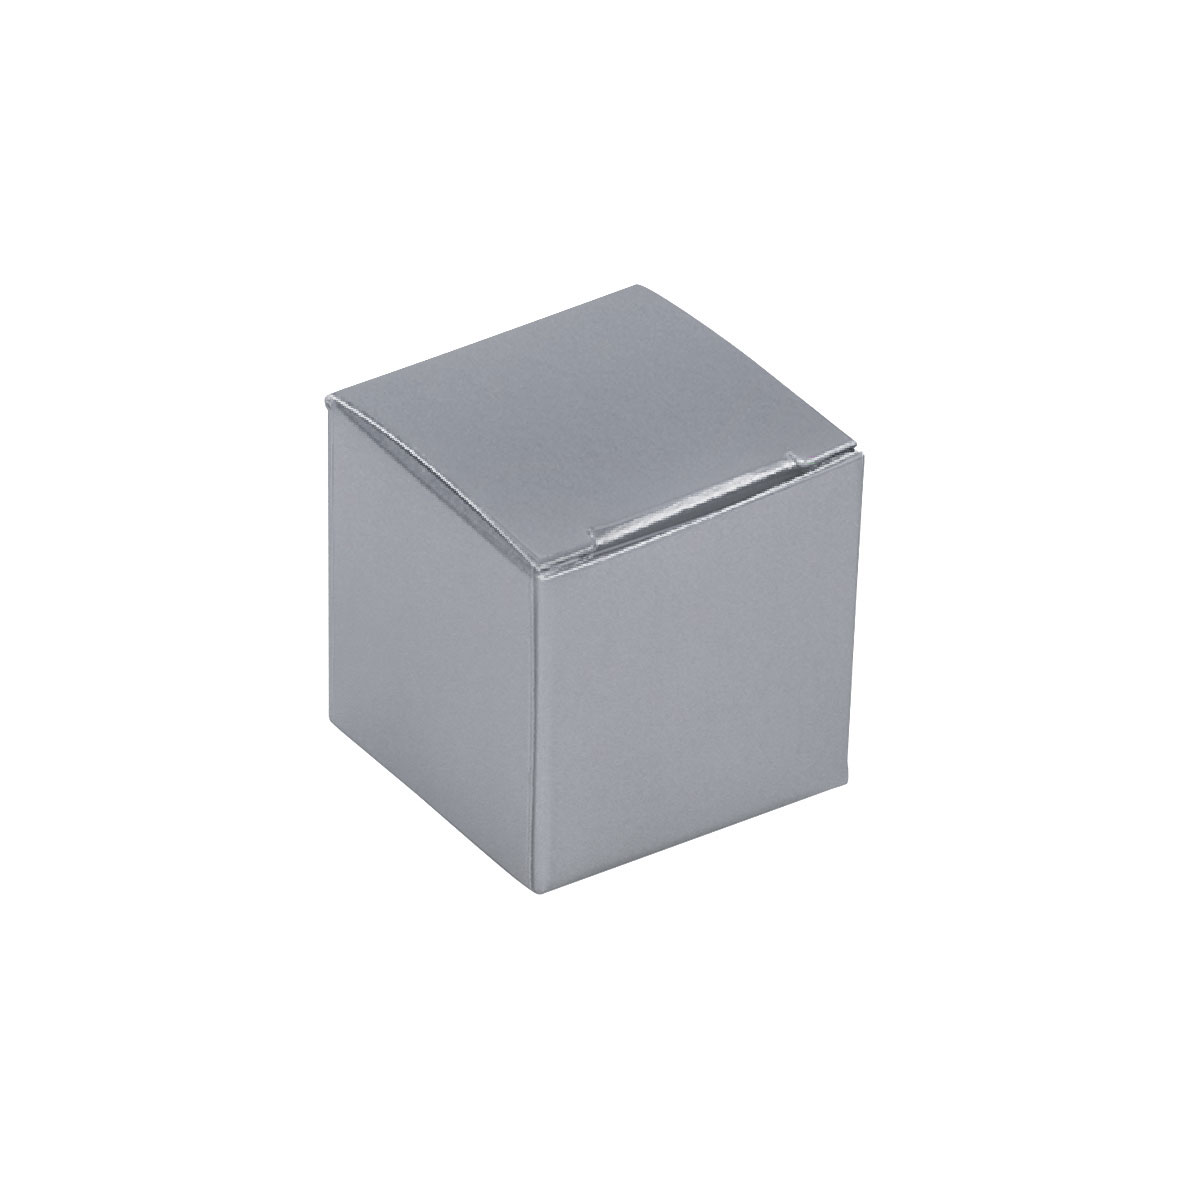 4c75c944ded26 Folding Carton